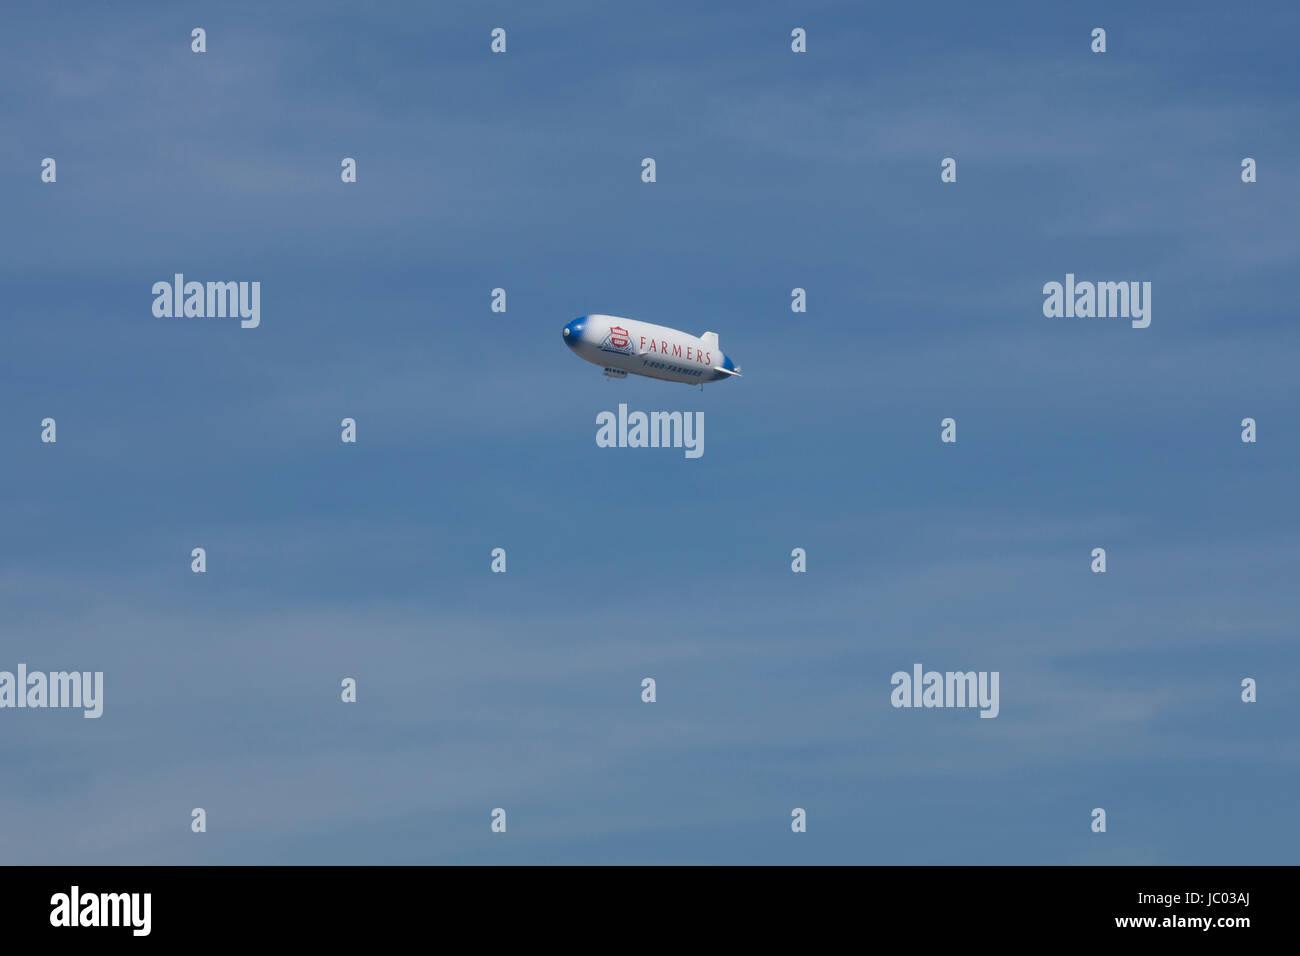 Farmers Insurance company advertisement  blimp aircraft - USA - Stock Image